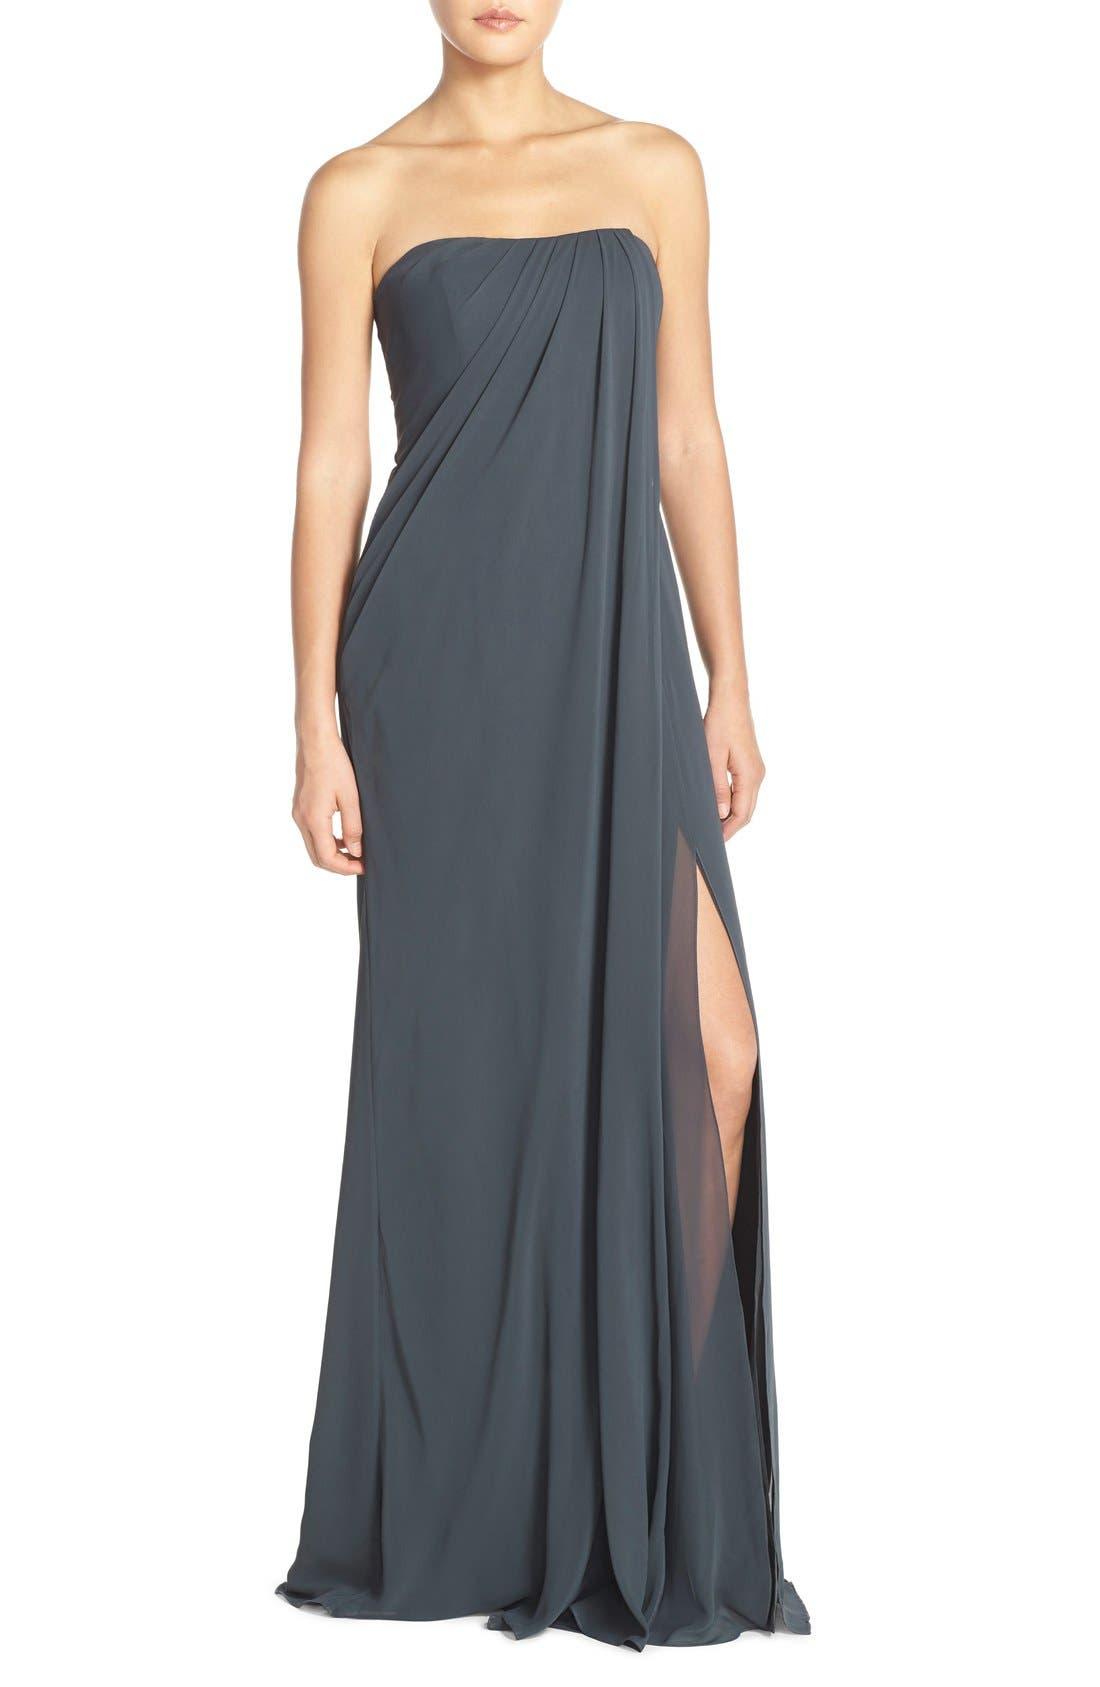 Raquel Front Slit Strapless Chiffon Gown, Main, color, 026